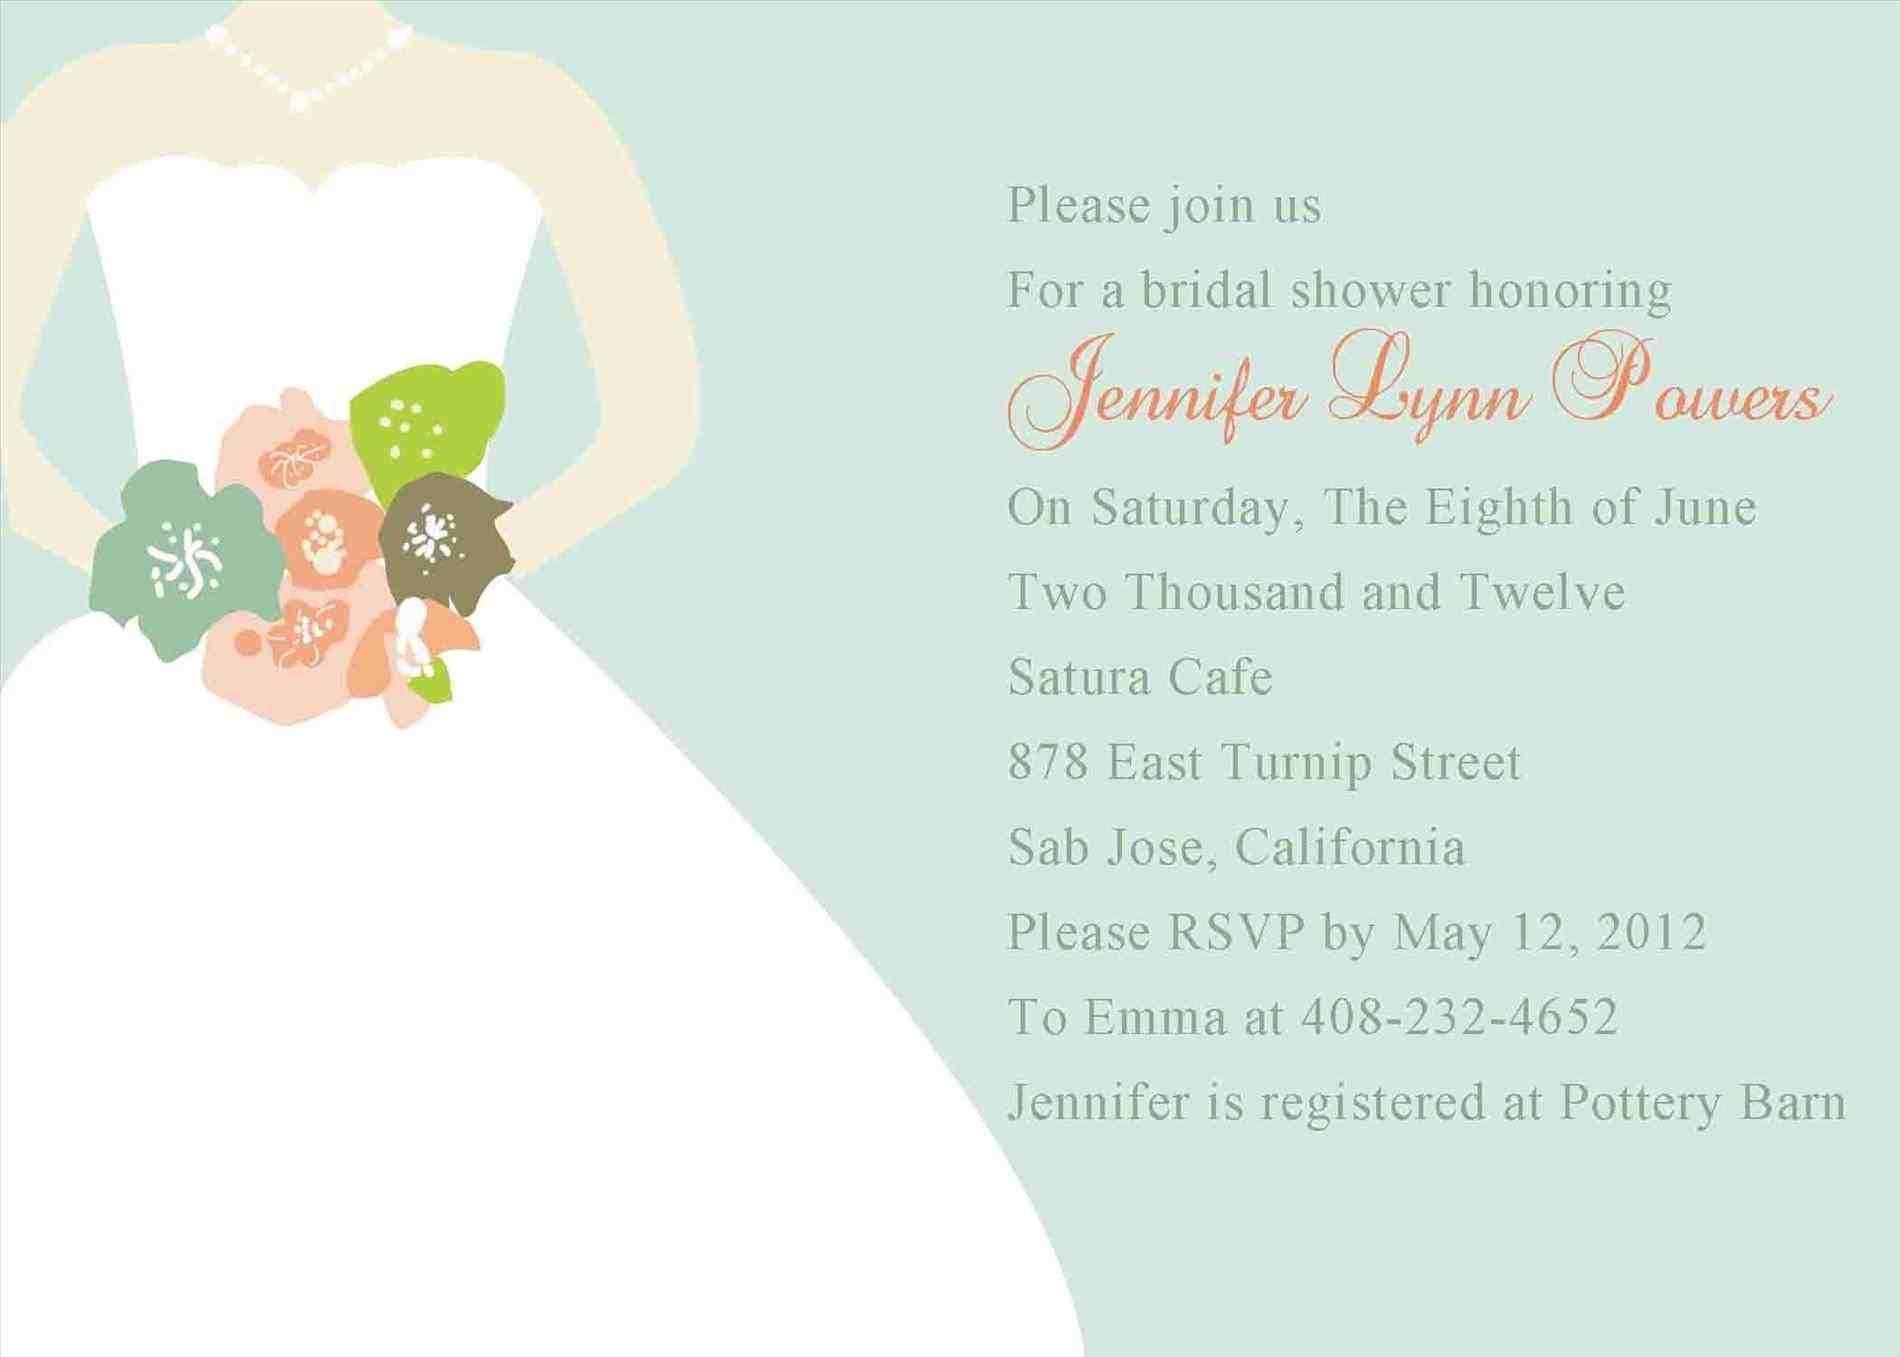 top 10 new post blank wedding shower invitations visit wedbridalsite